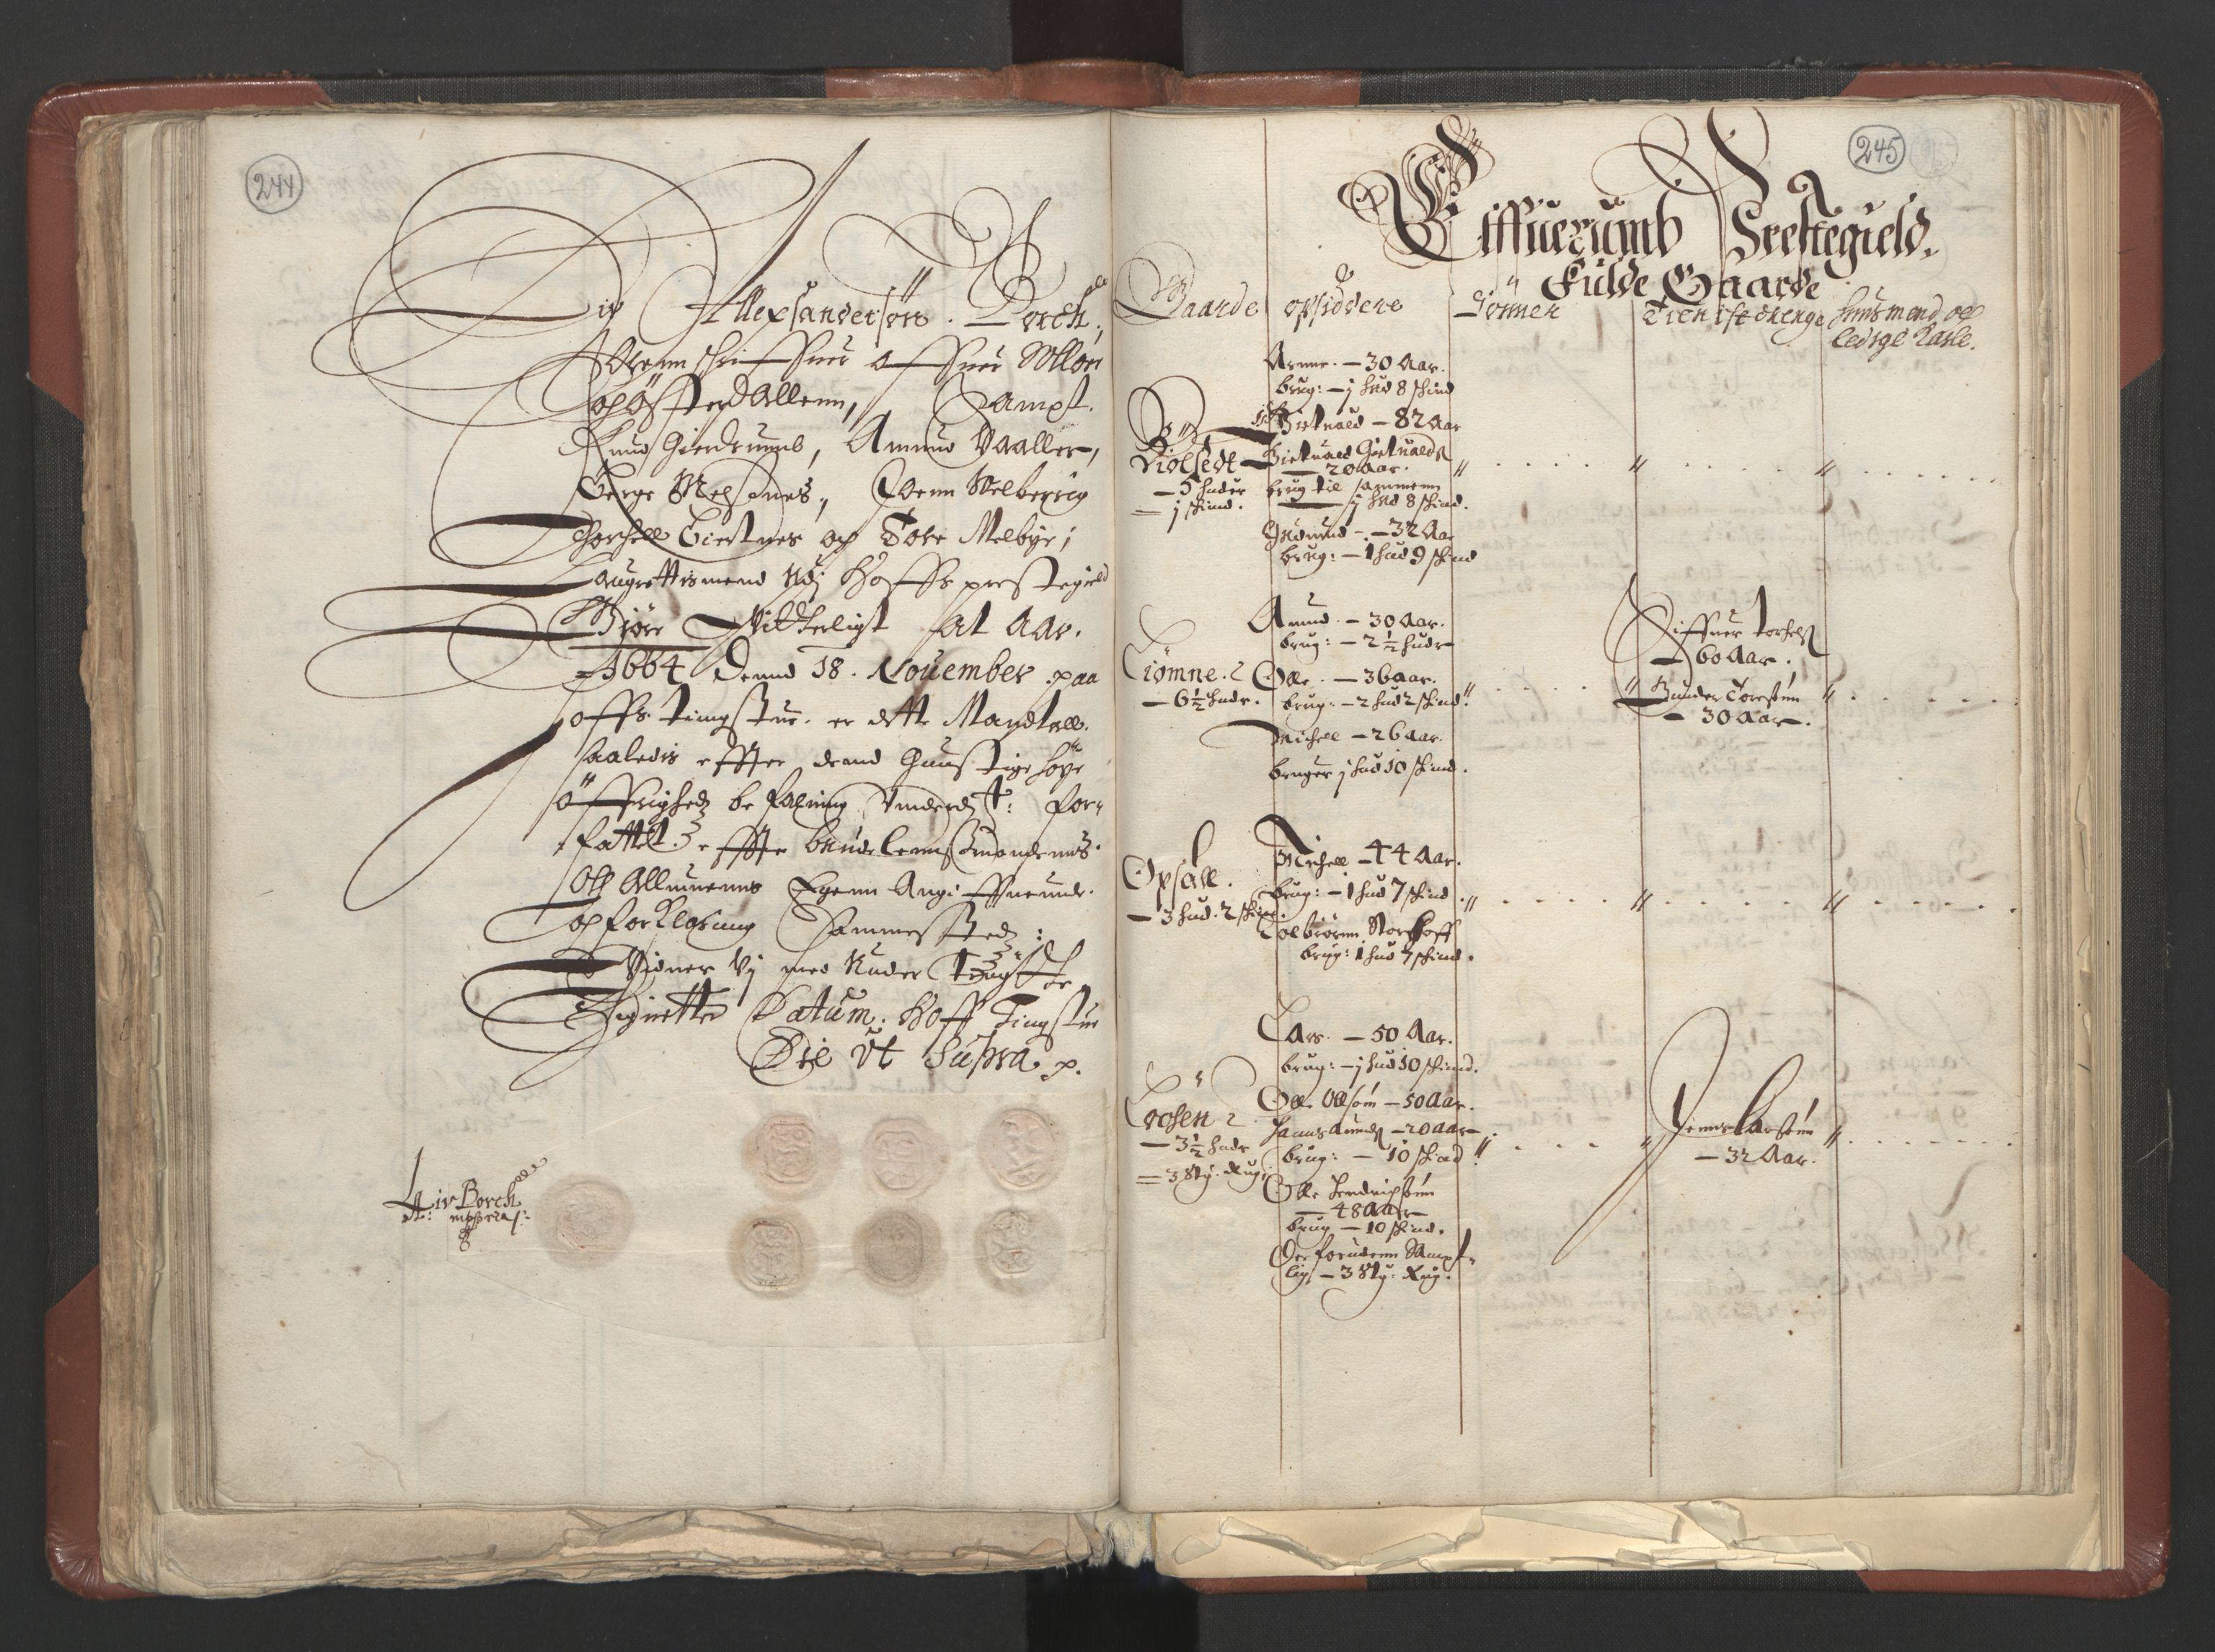 RA, Fogdenes og sorenskrivernes manntall 1664-1666, nr. 3: Hedmark fogderi og Solør, Østerdal og Odal fogderi, 1664, s. 244-245